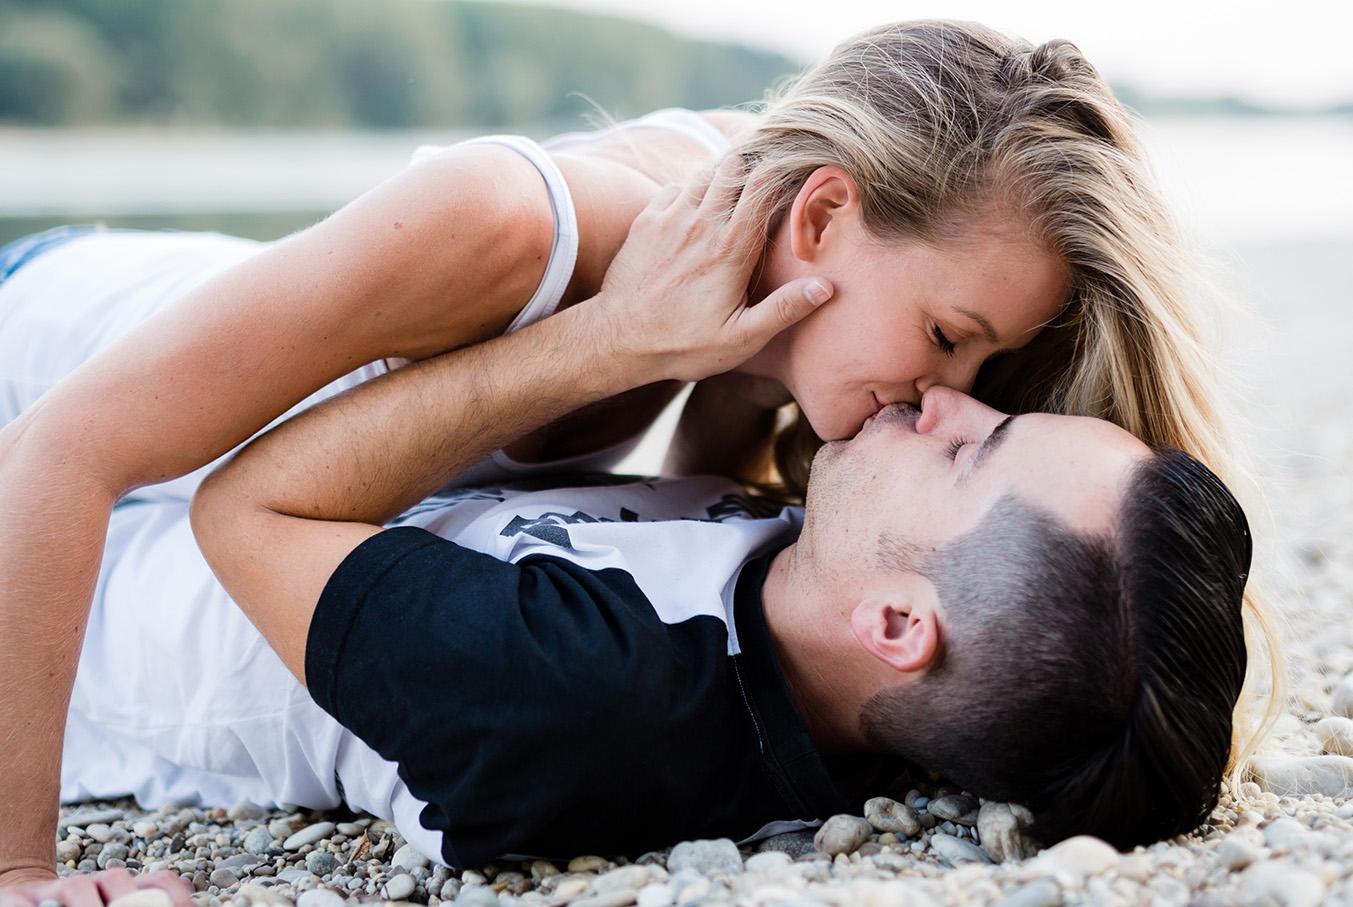 Vienna_Wien_Couple_Hochzeit_Paar_Verlobung_Engagement_Shooting_19